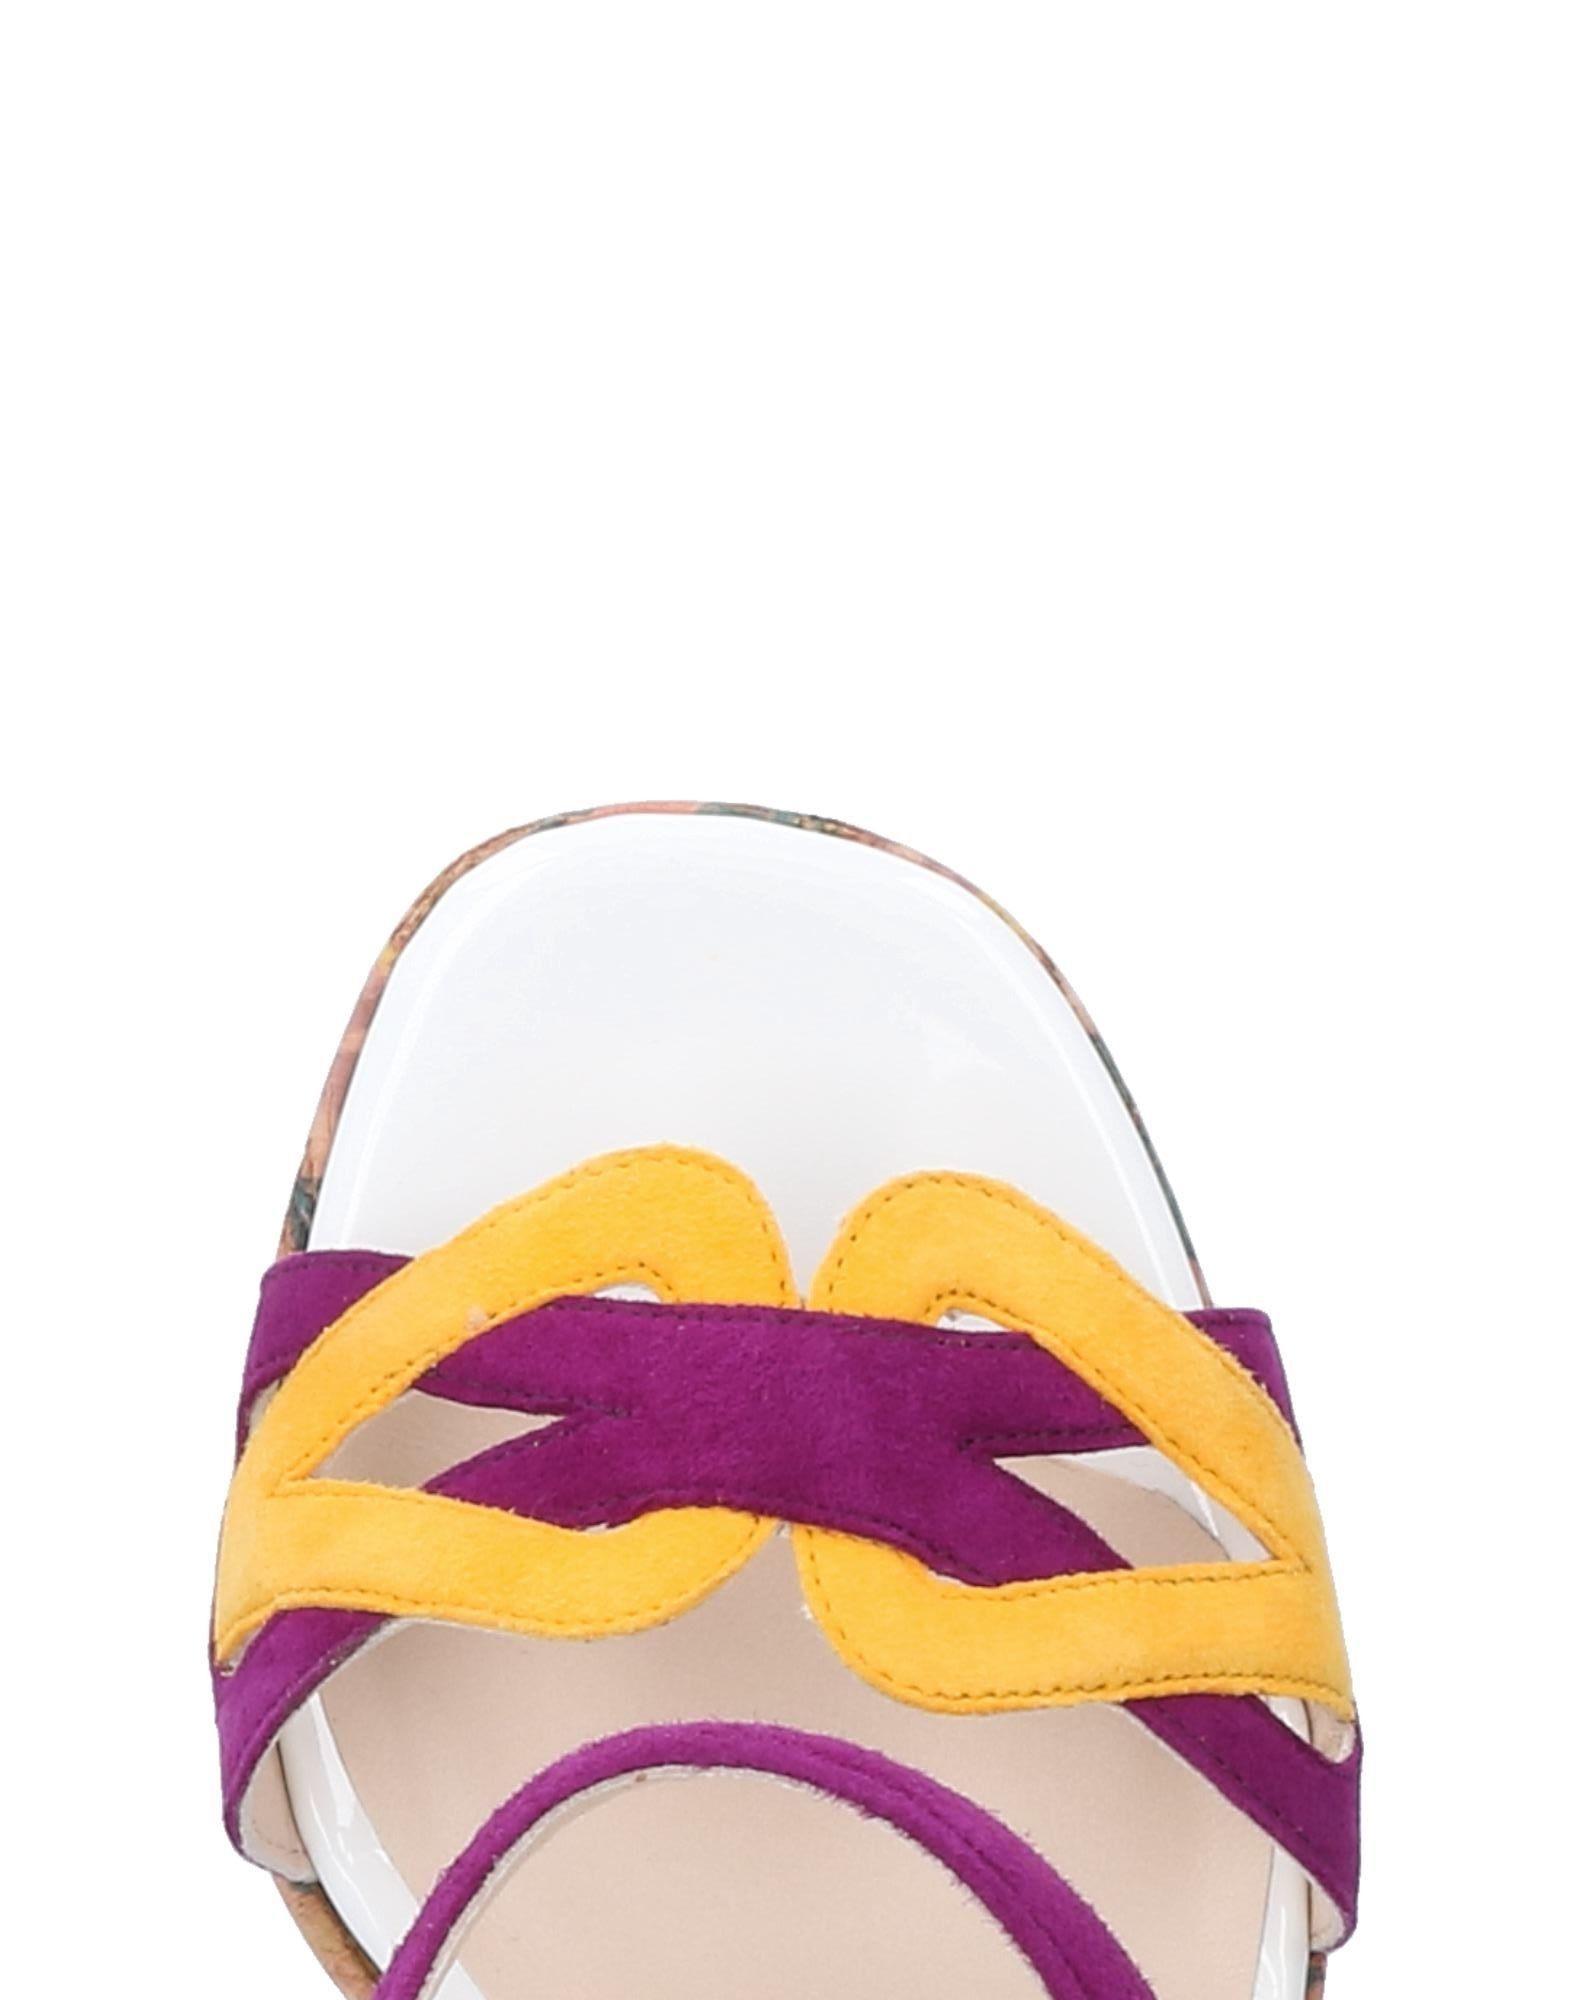 Stilvolle Stilvolle Stilvolle billige Schuhe Lella Baldi Sandalen Damen  11502887IG 4111d0